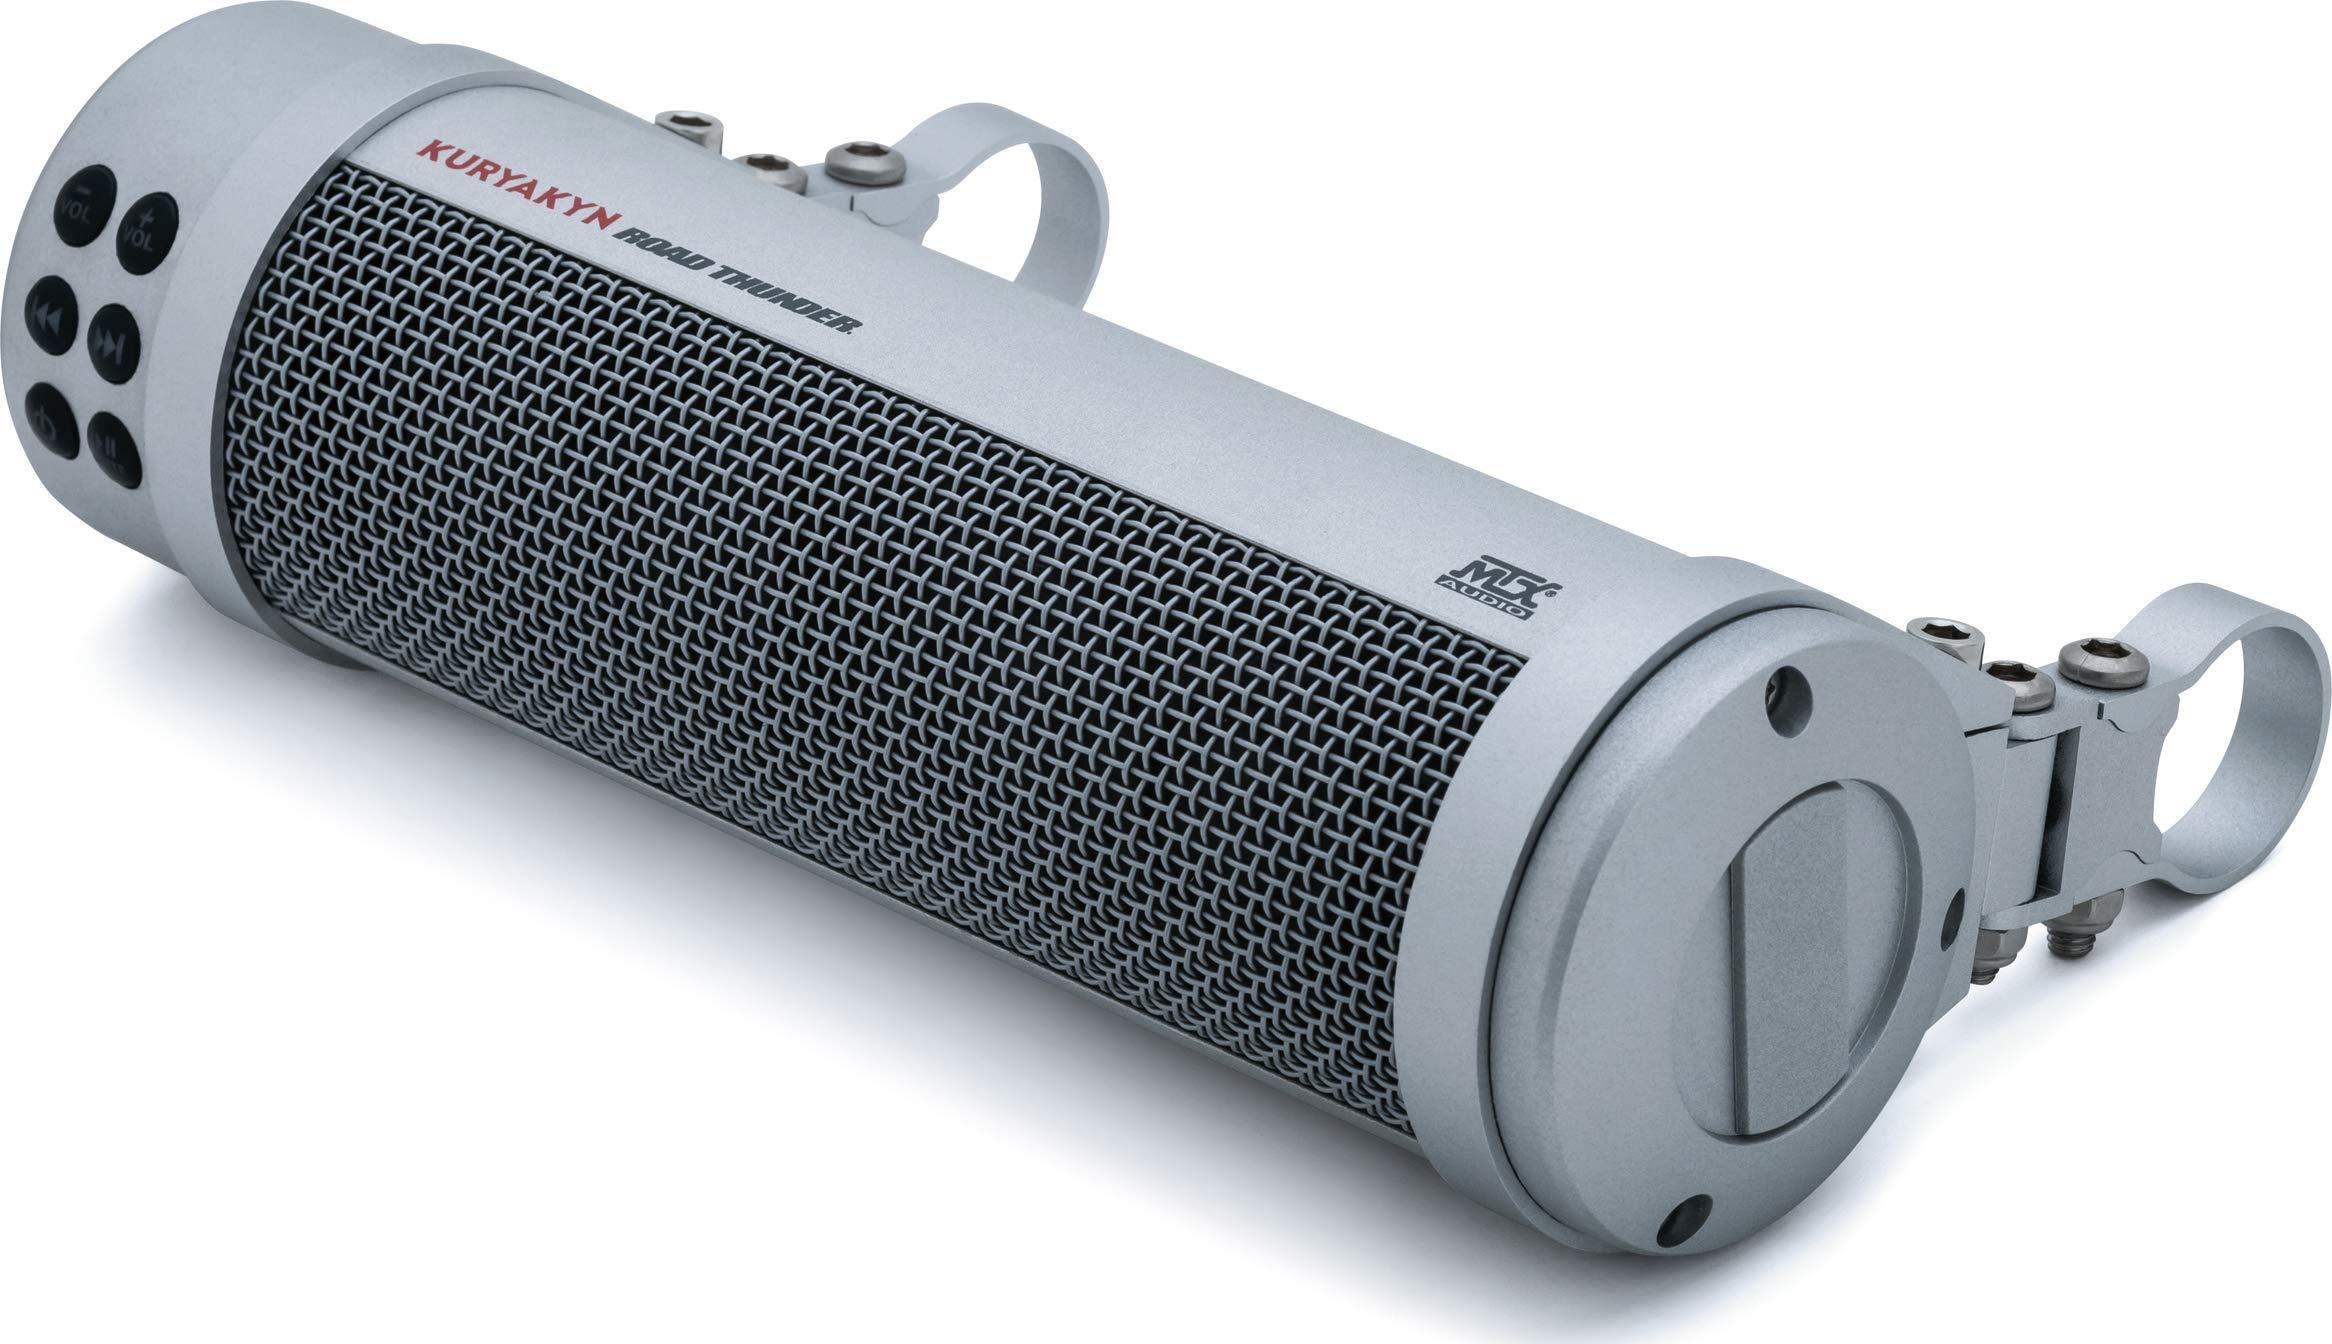 Kuryakyn 2719 MTX Road Thunder Weather Resistant Motorcycle Sound Bar Plus: 300 Watt Handlebar Mounted Audio Speakers with Bluetooth, USB Power Charger, Satin Silver